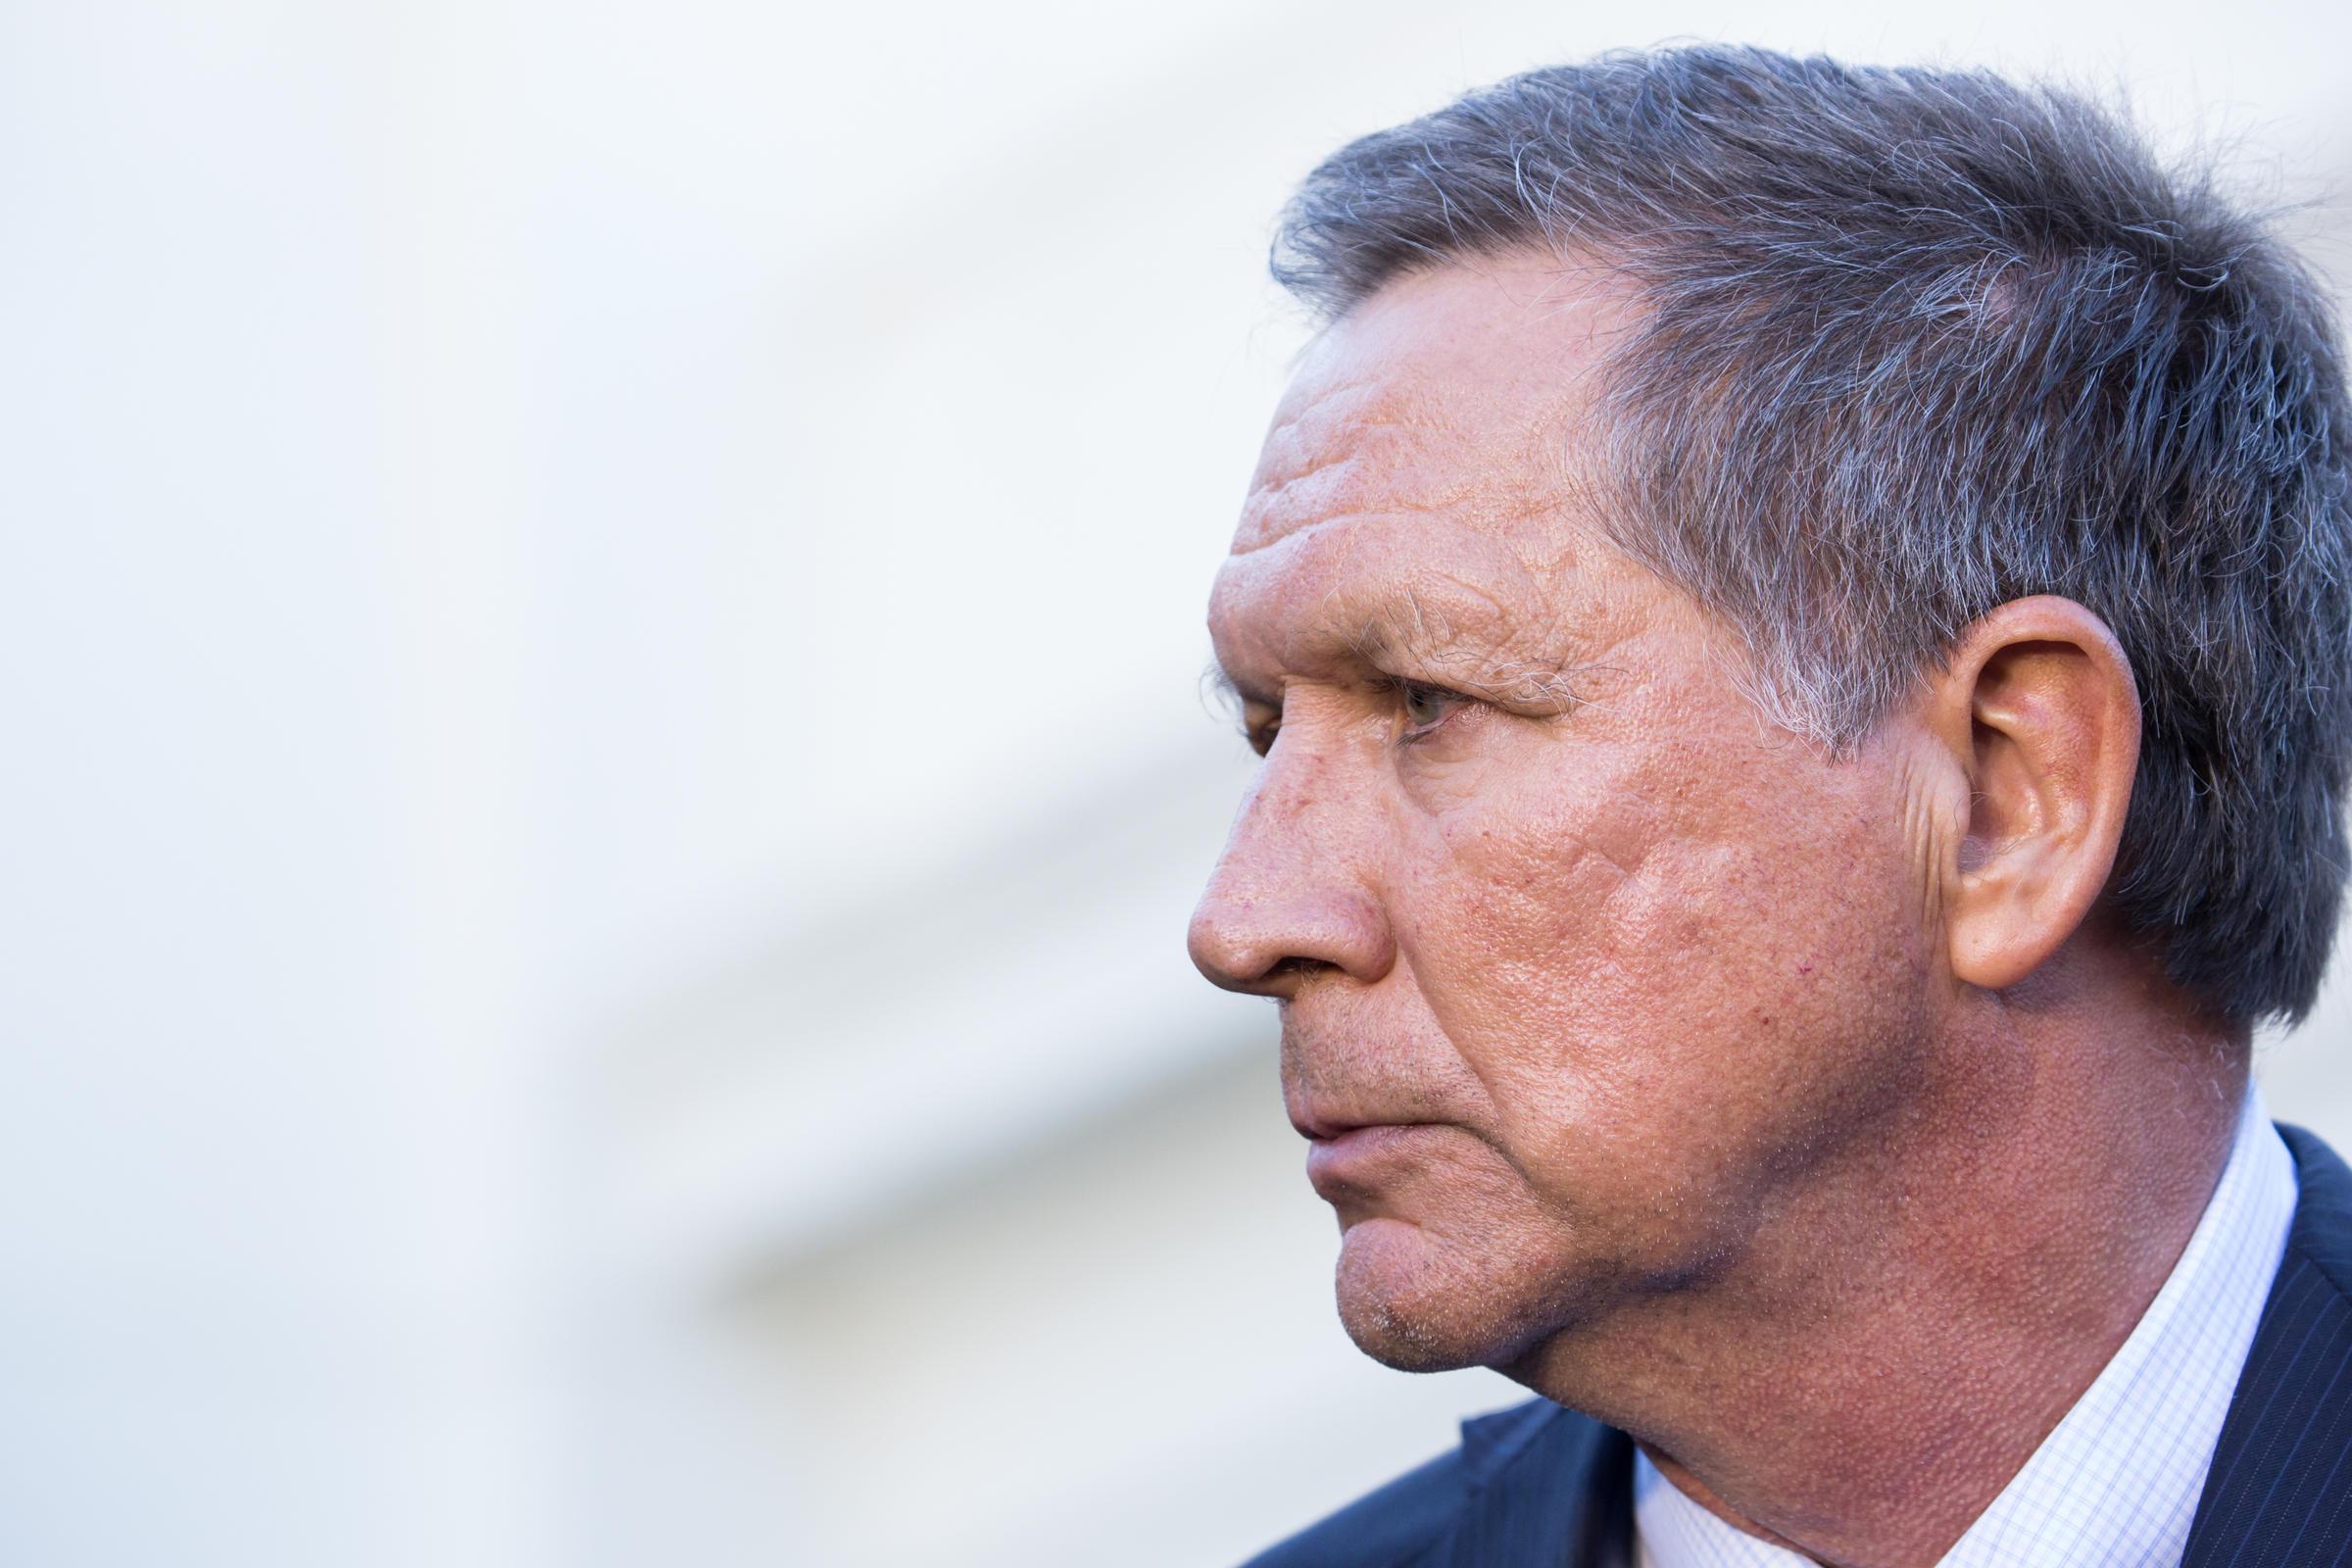 Ohio Gov Kasich Signs 20 Week Abortion Limit Rejects